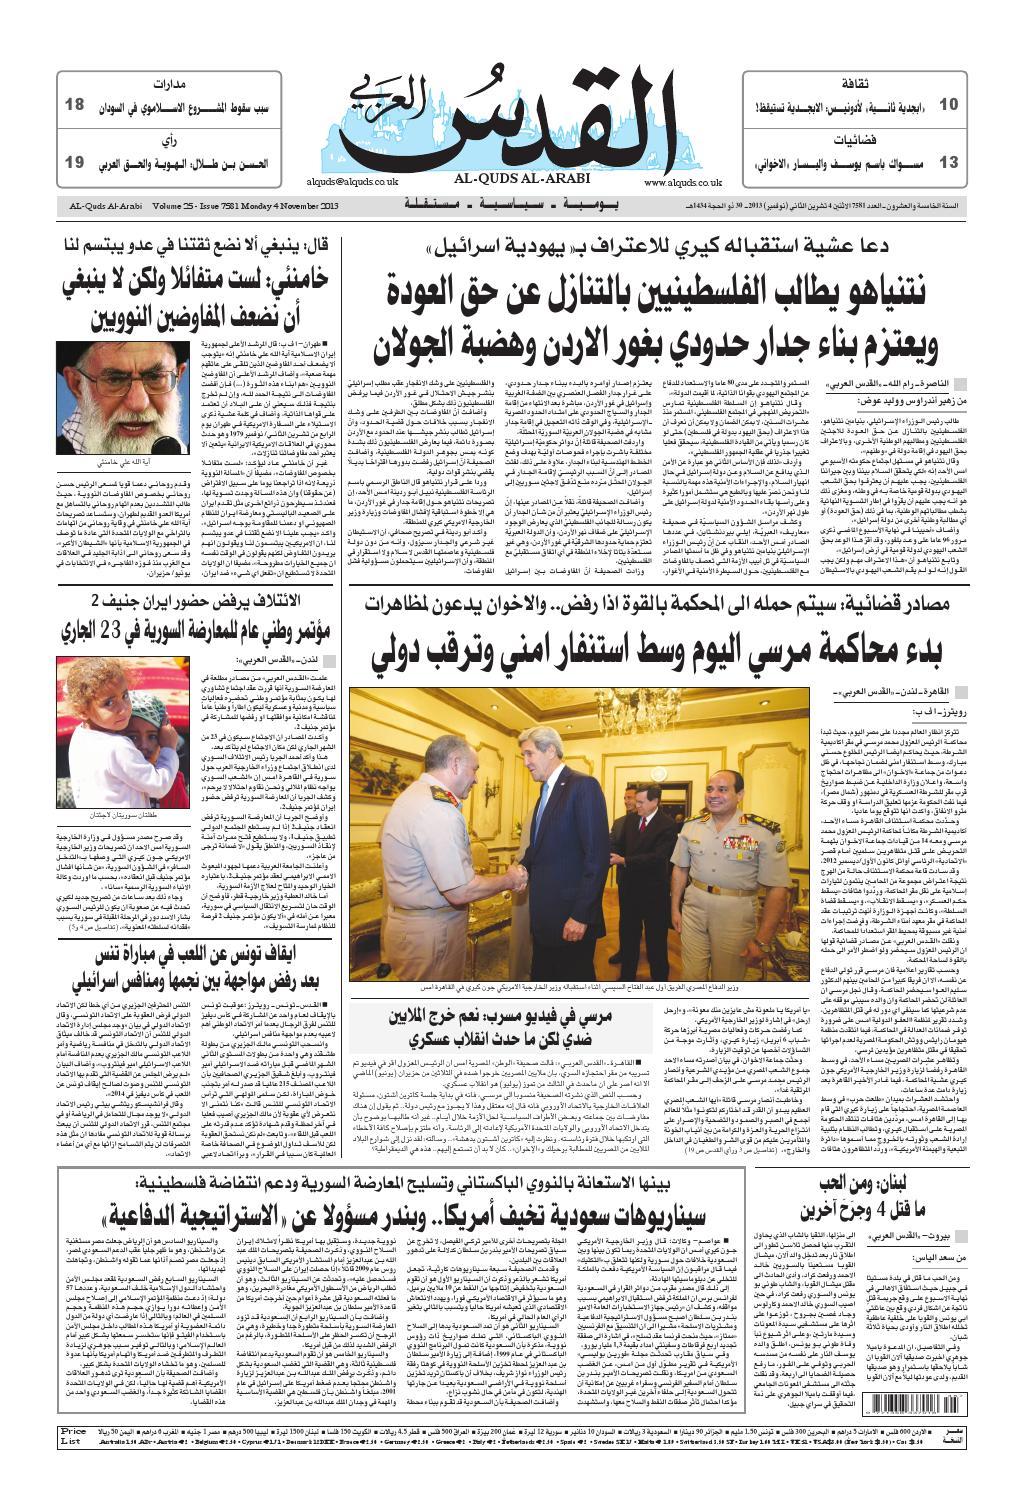 9ee3dc4bd صحيفة القدس العربي , الإثنين 04 11 2013 by مركز الحدث - issuu